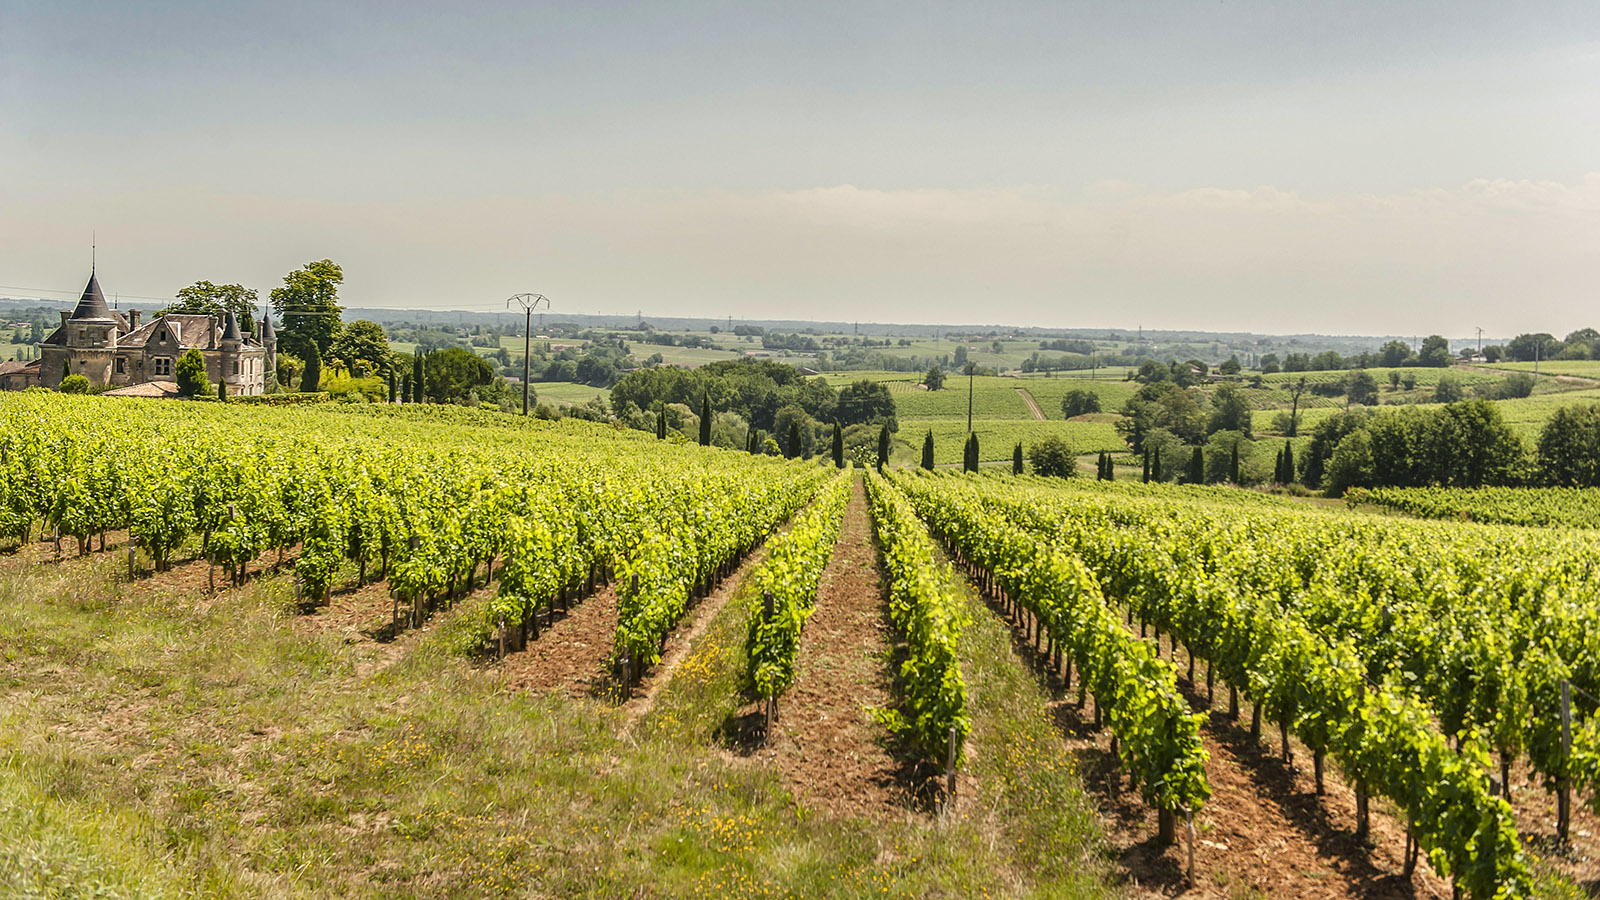 Die Weingärten des Château de la Grave bei Bourg-sur-Gironde. Foto: Hilke Maunder